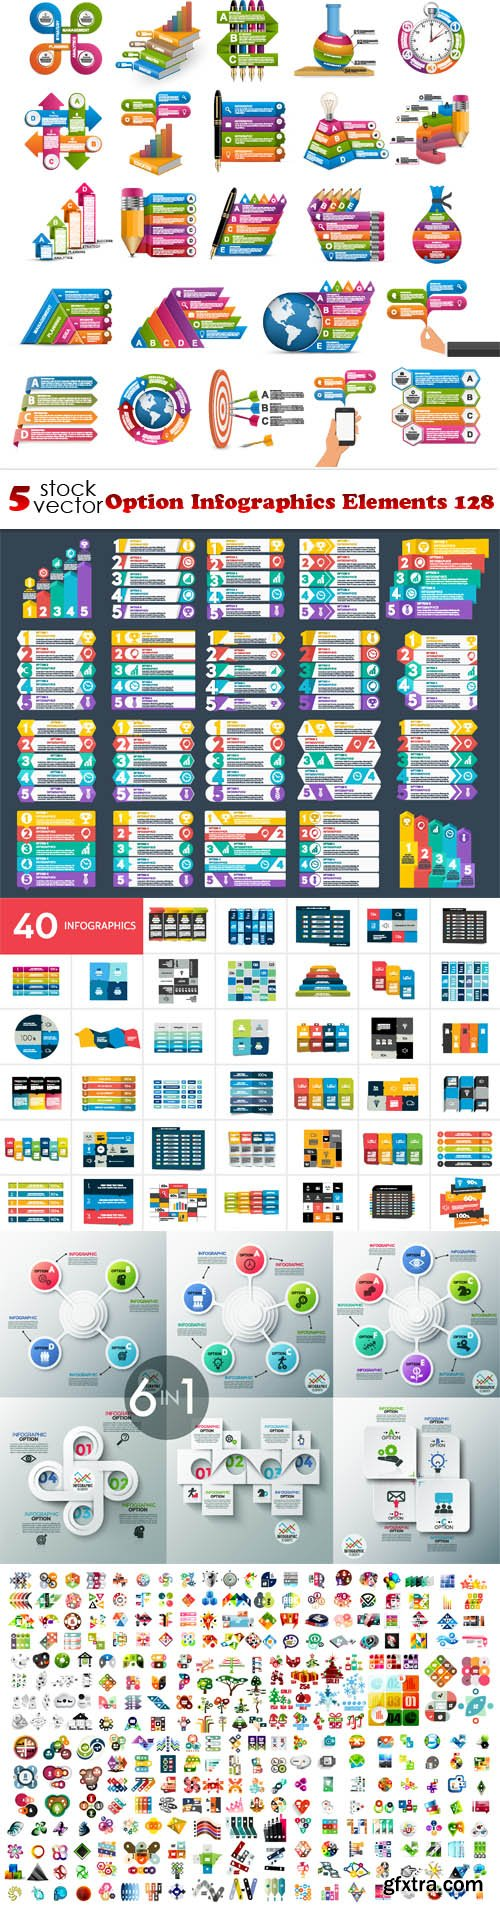 Vectors - Option Infographics Elements 128